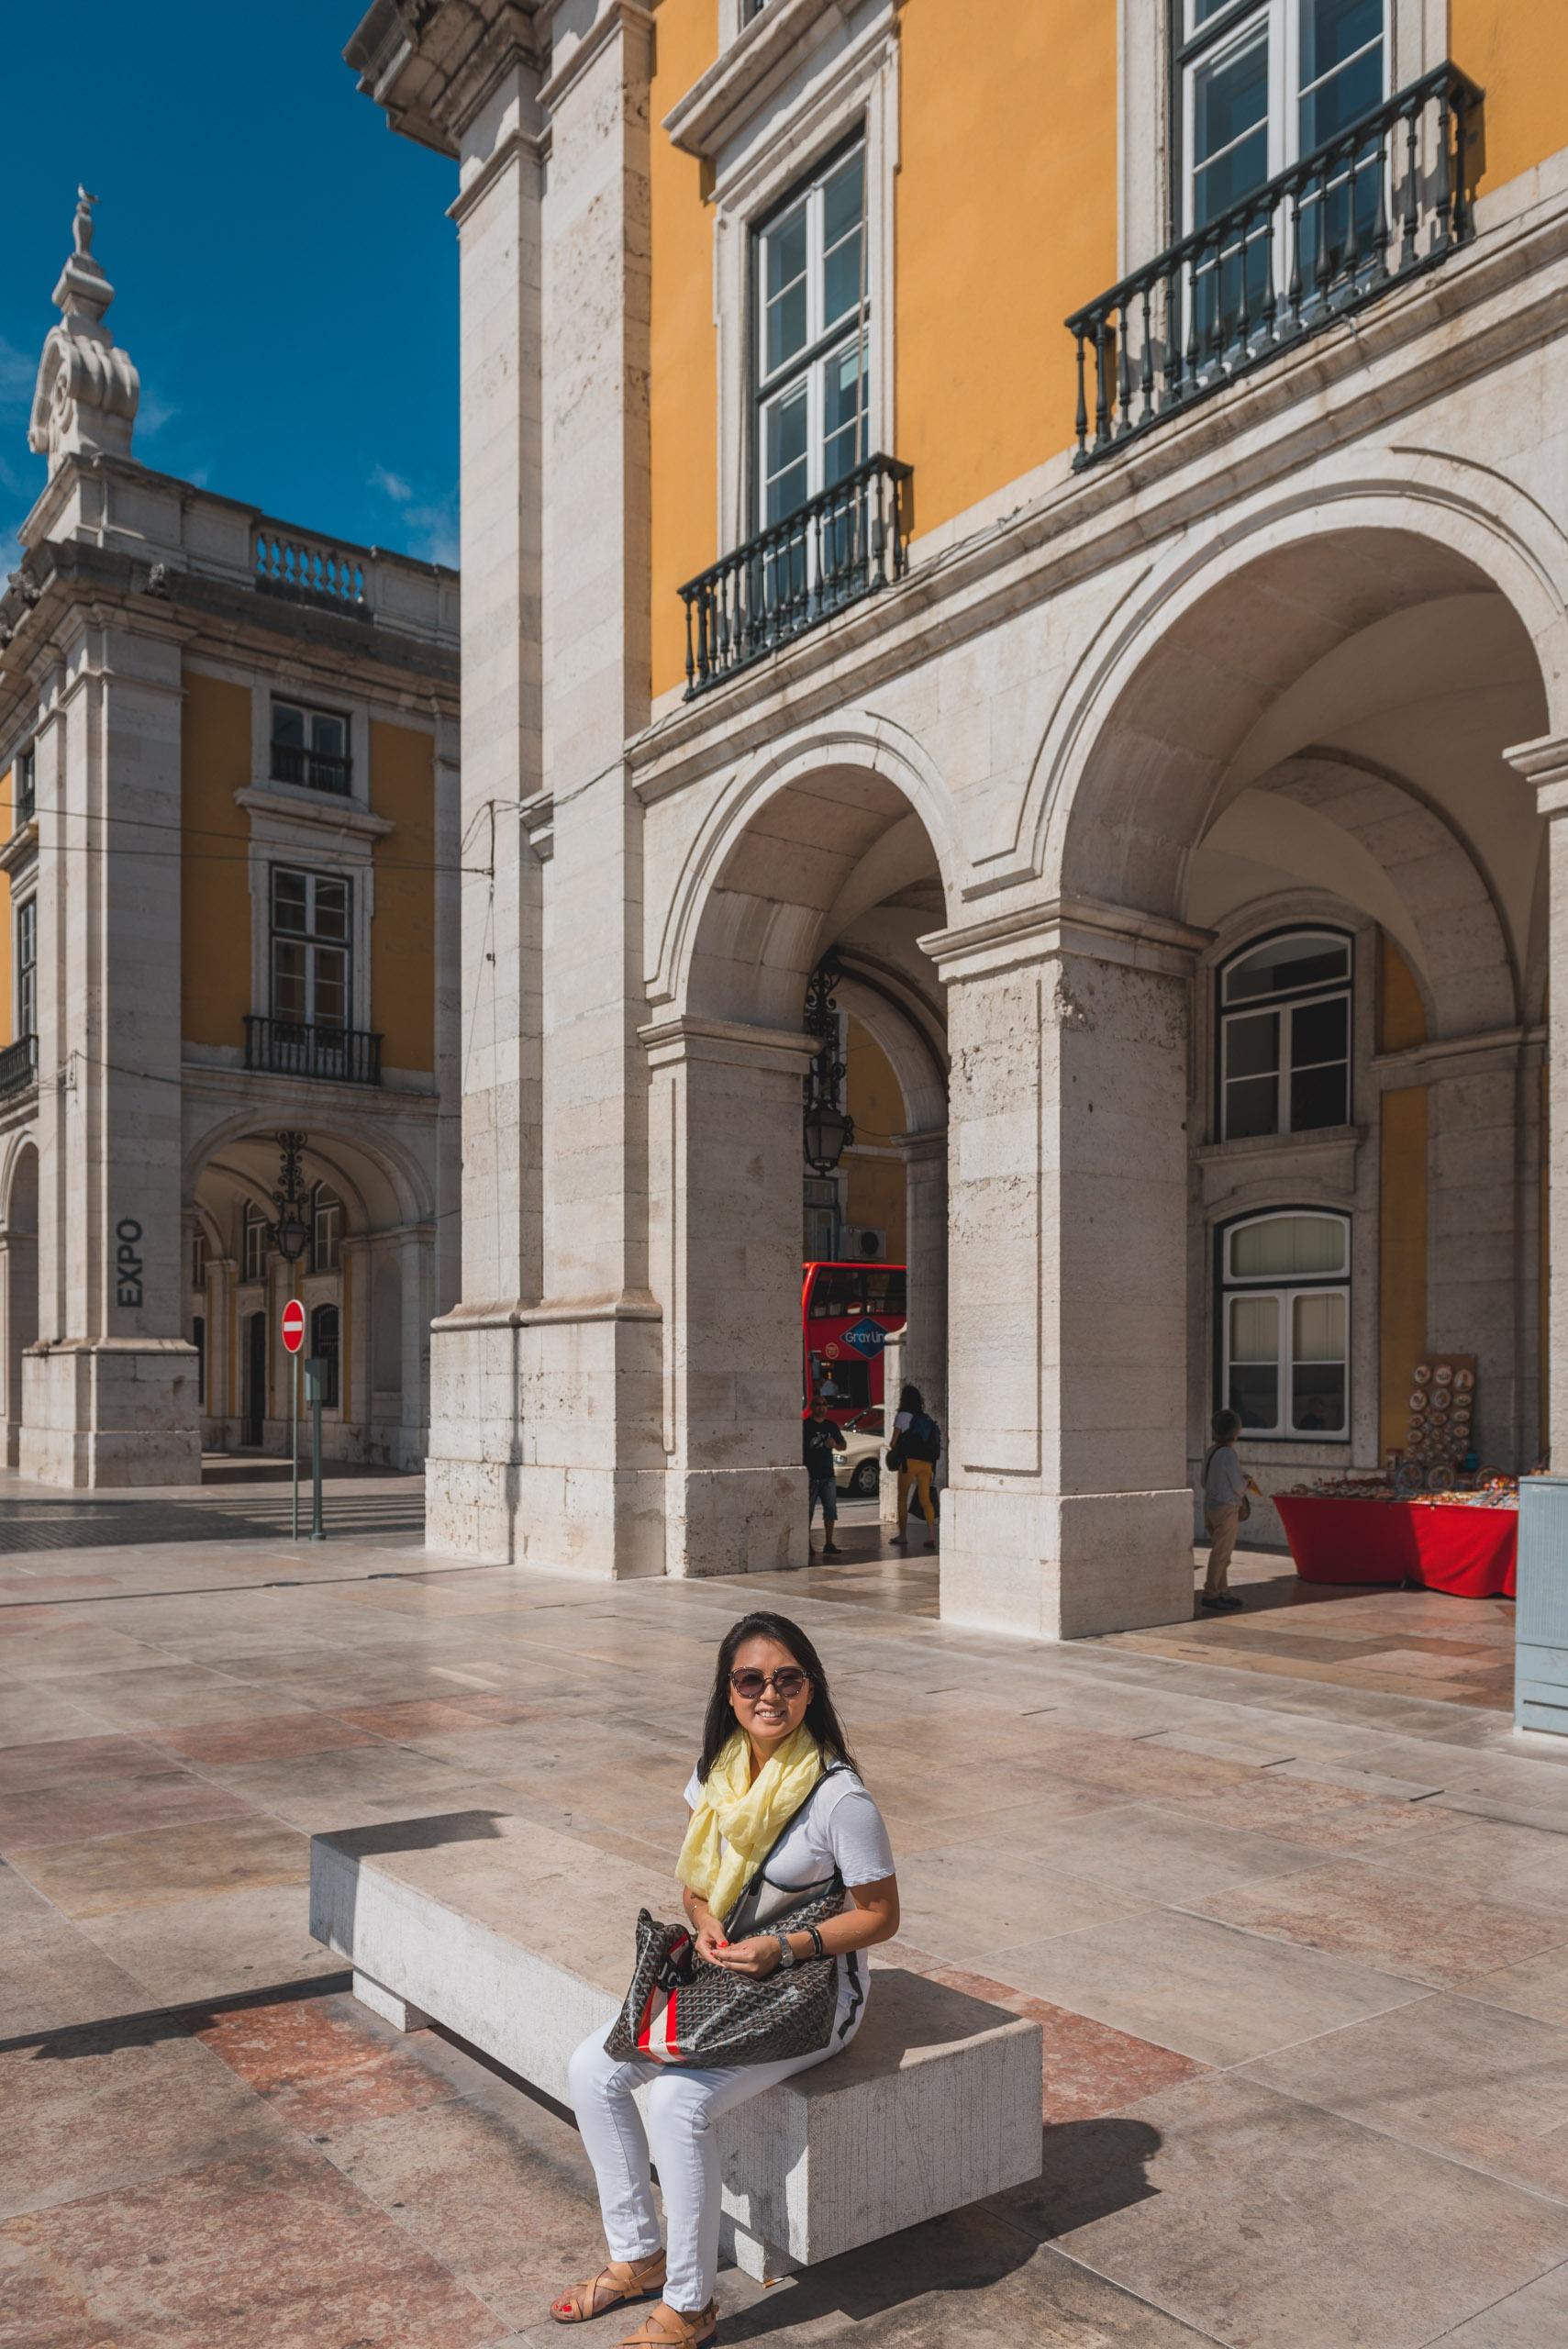 Portugal - Lisbon - 2012-0921-DSC_1347_121254